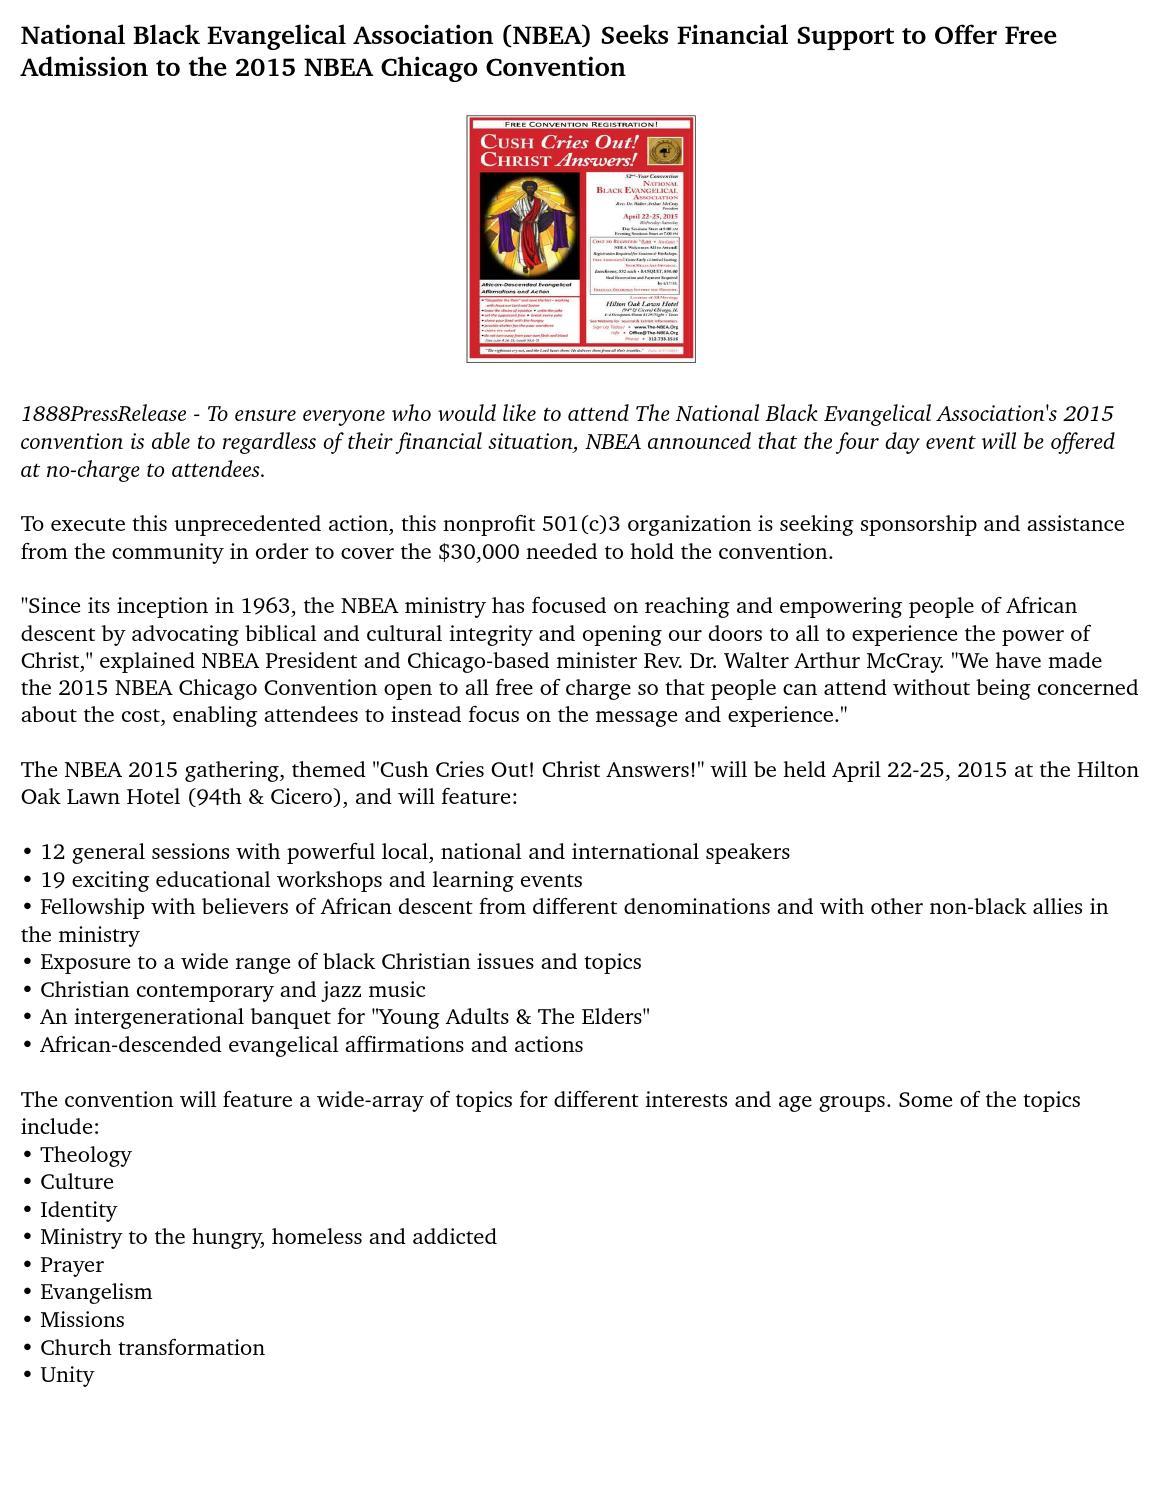 National Black Evangelical Association (NBEA) Seeks